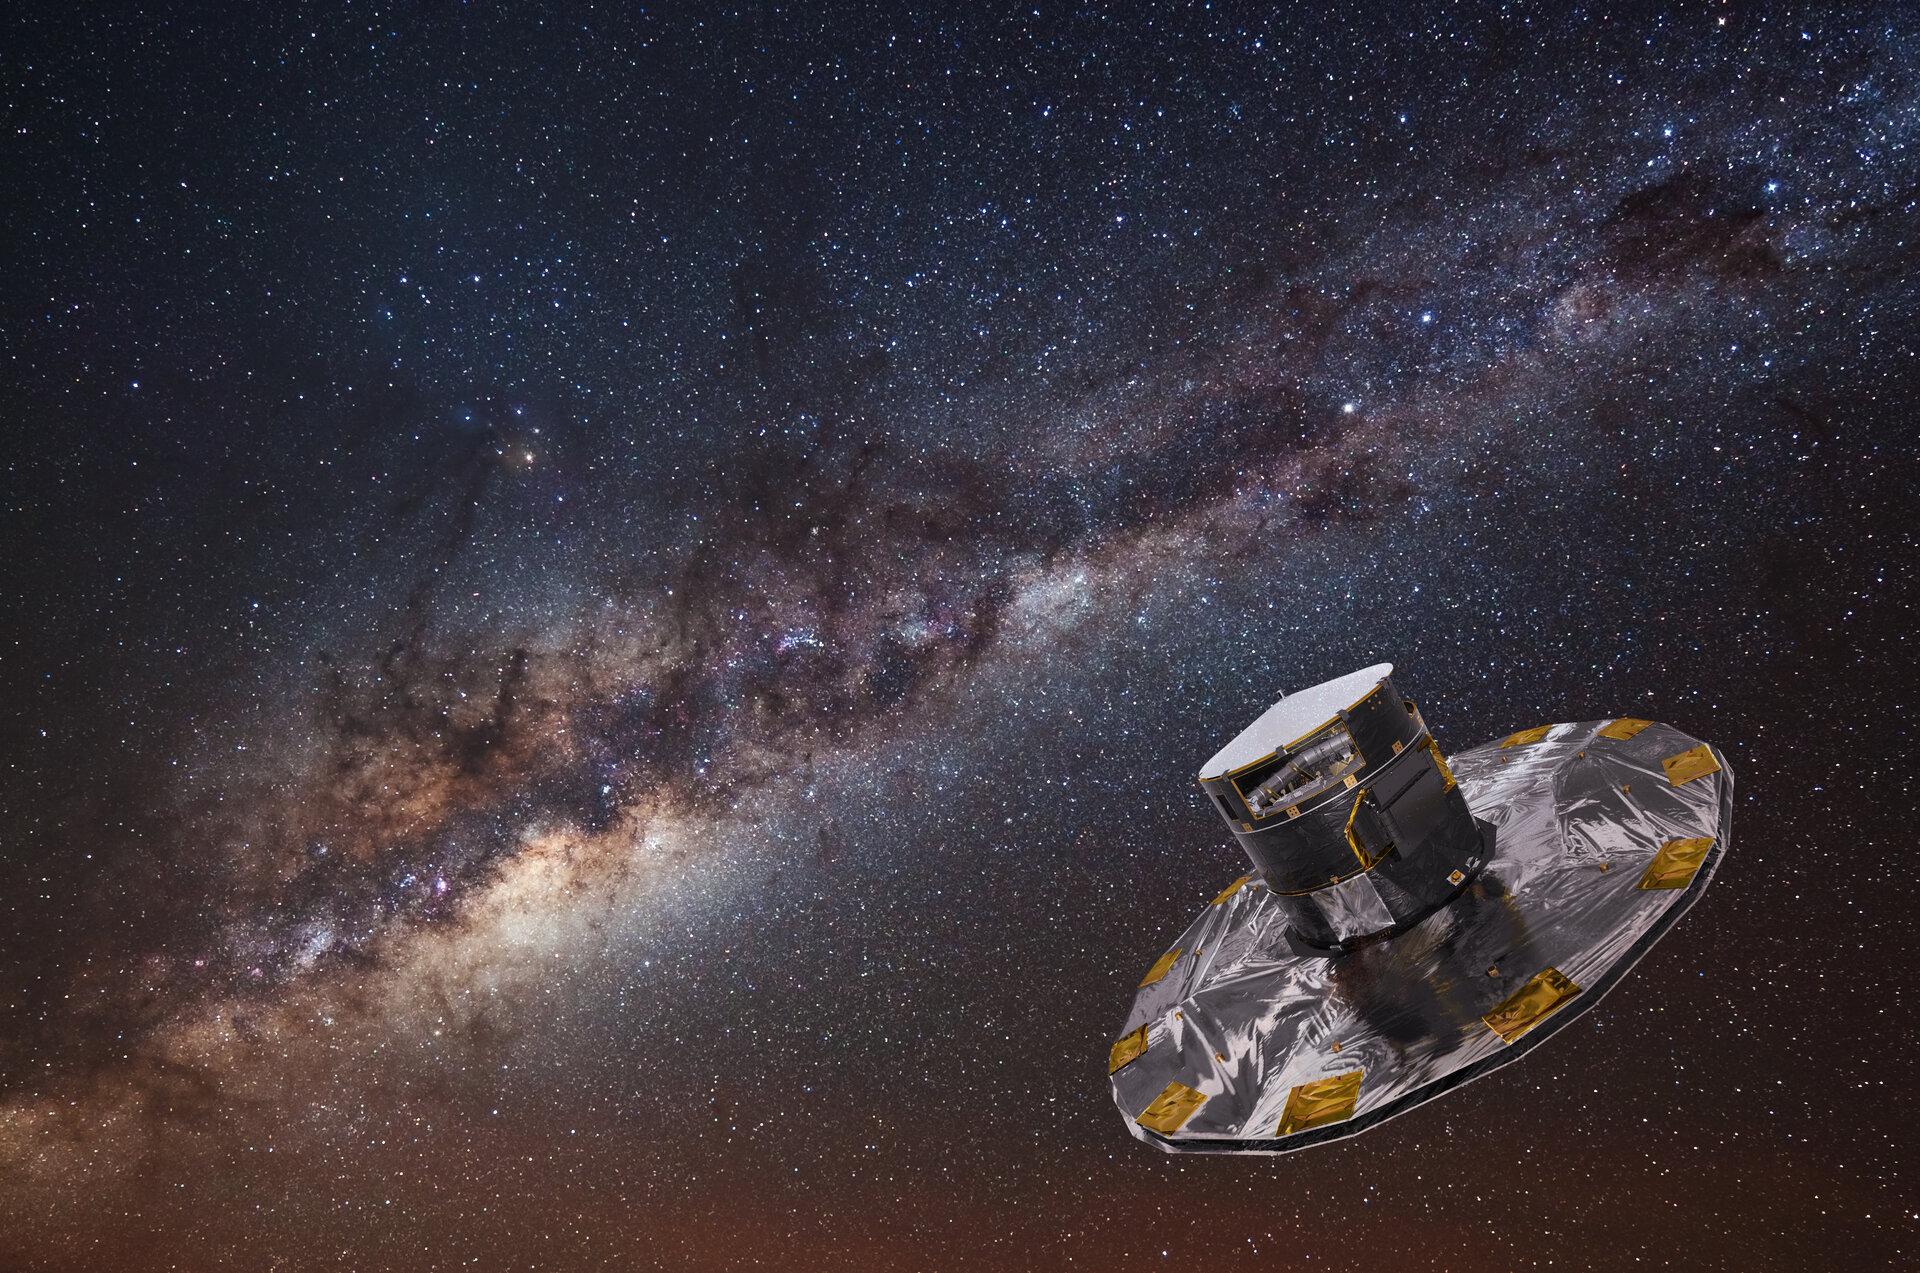 European Space Agency's (ESA) Gaia spacecraft